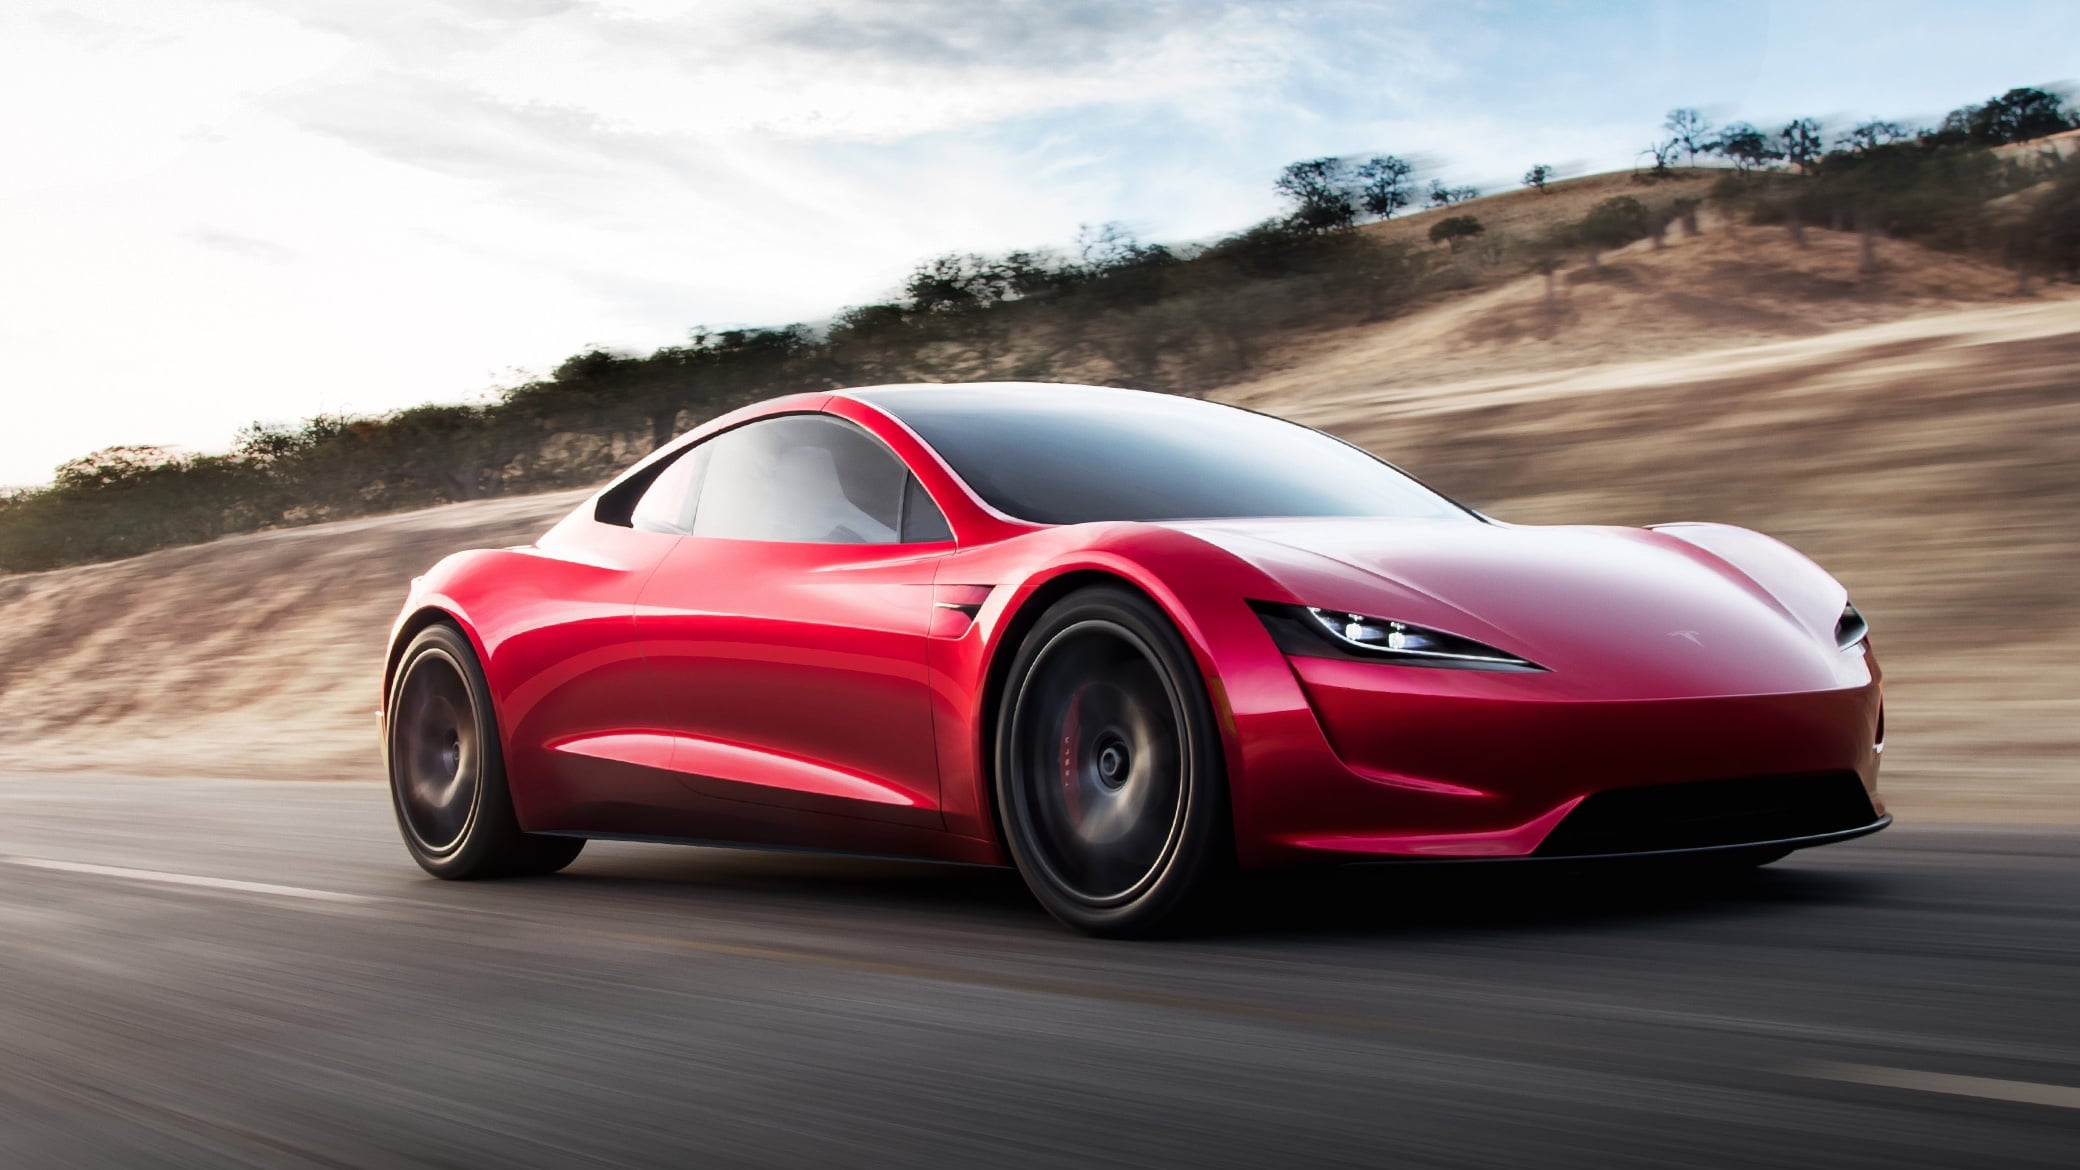 Tesla roadster https://huglero.com